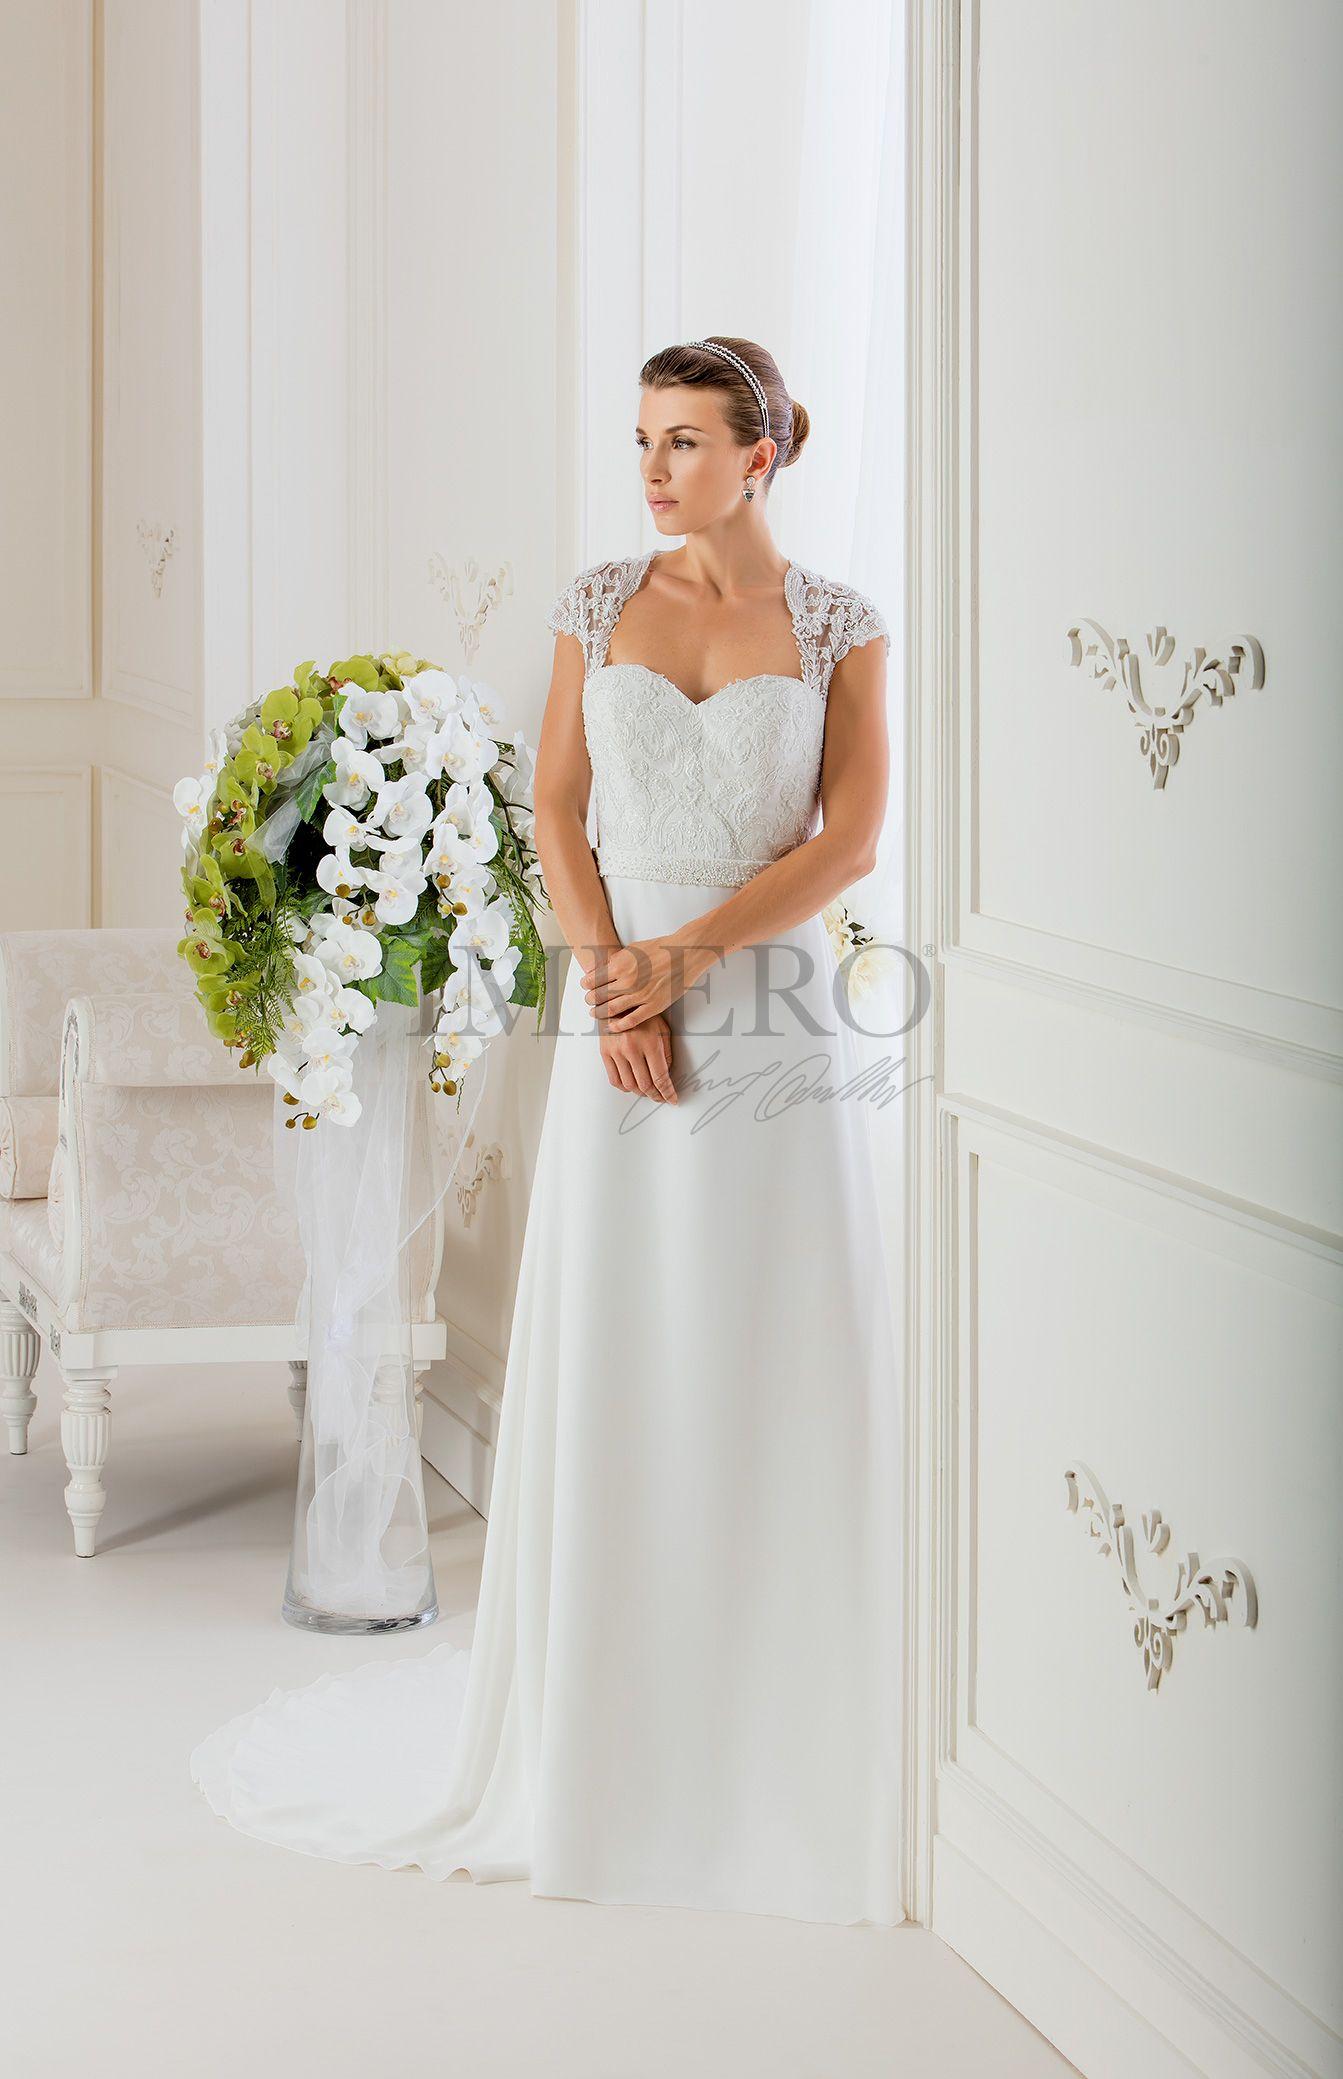 HOA #sposa #abiti #dress #bride #bridal #wedding #2016 #impero #matrimonio #nozze